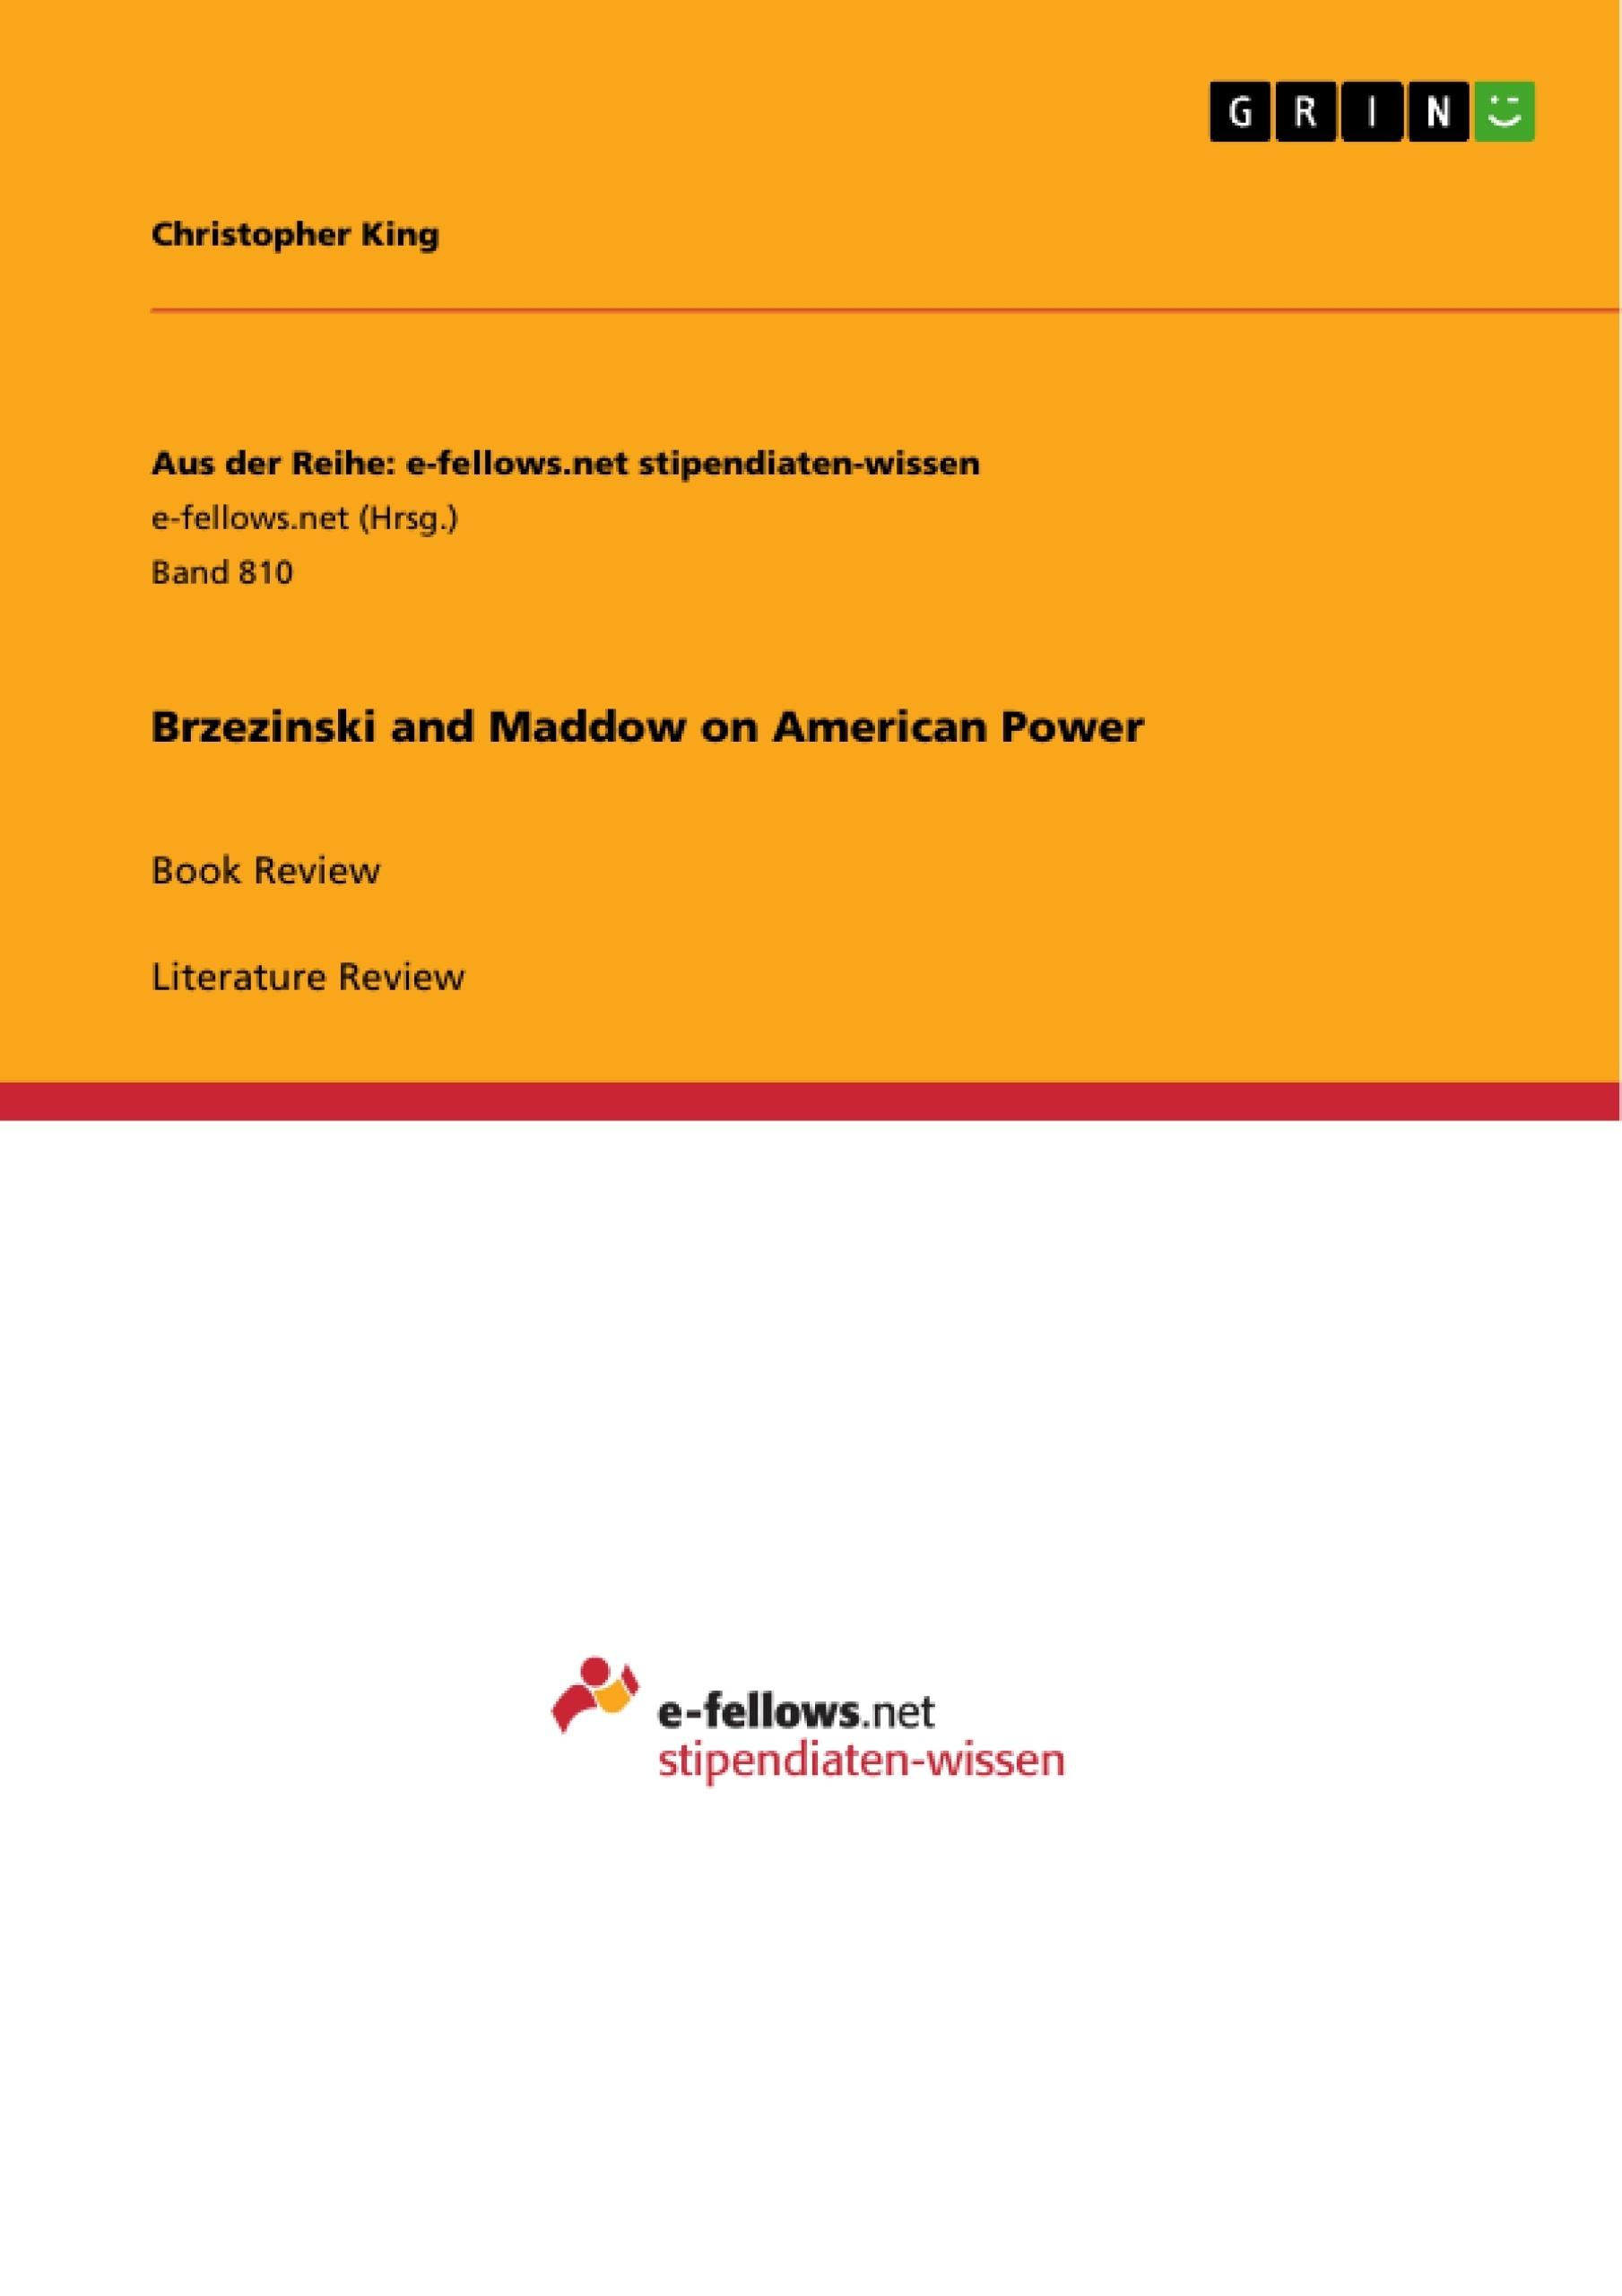 Title: Brzezinski and Maddow on American Power